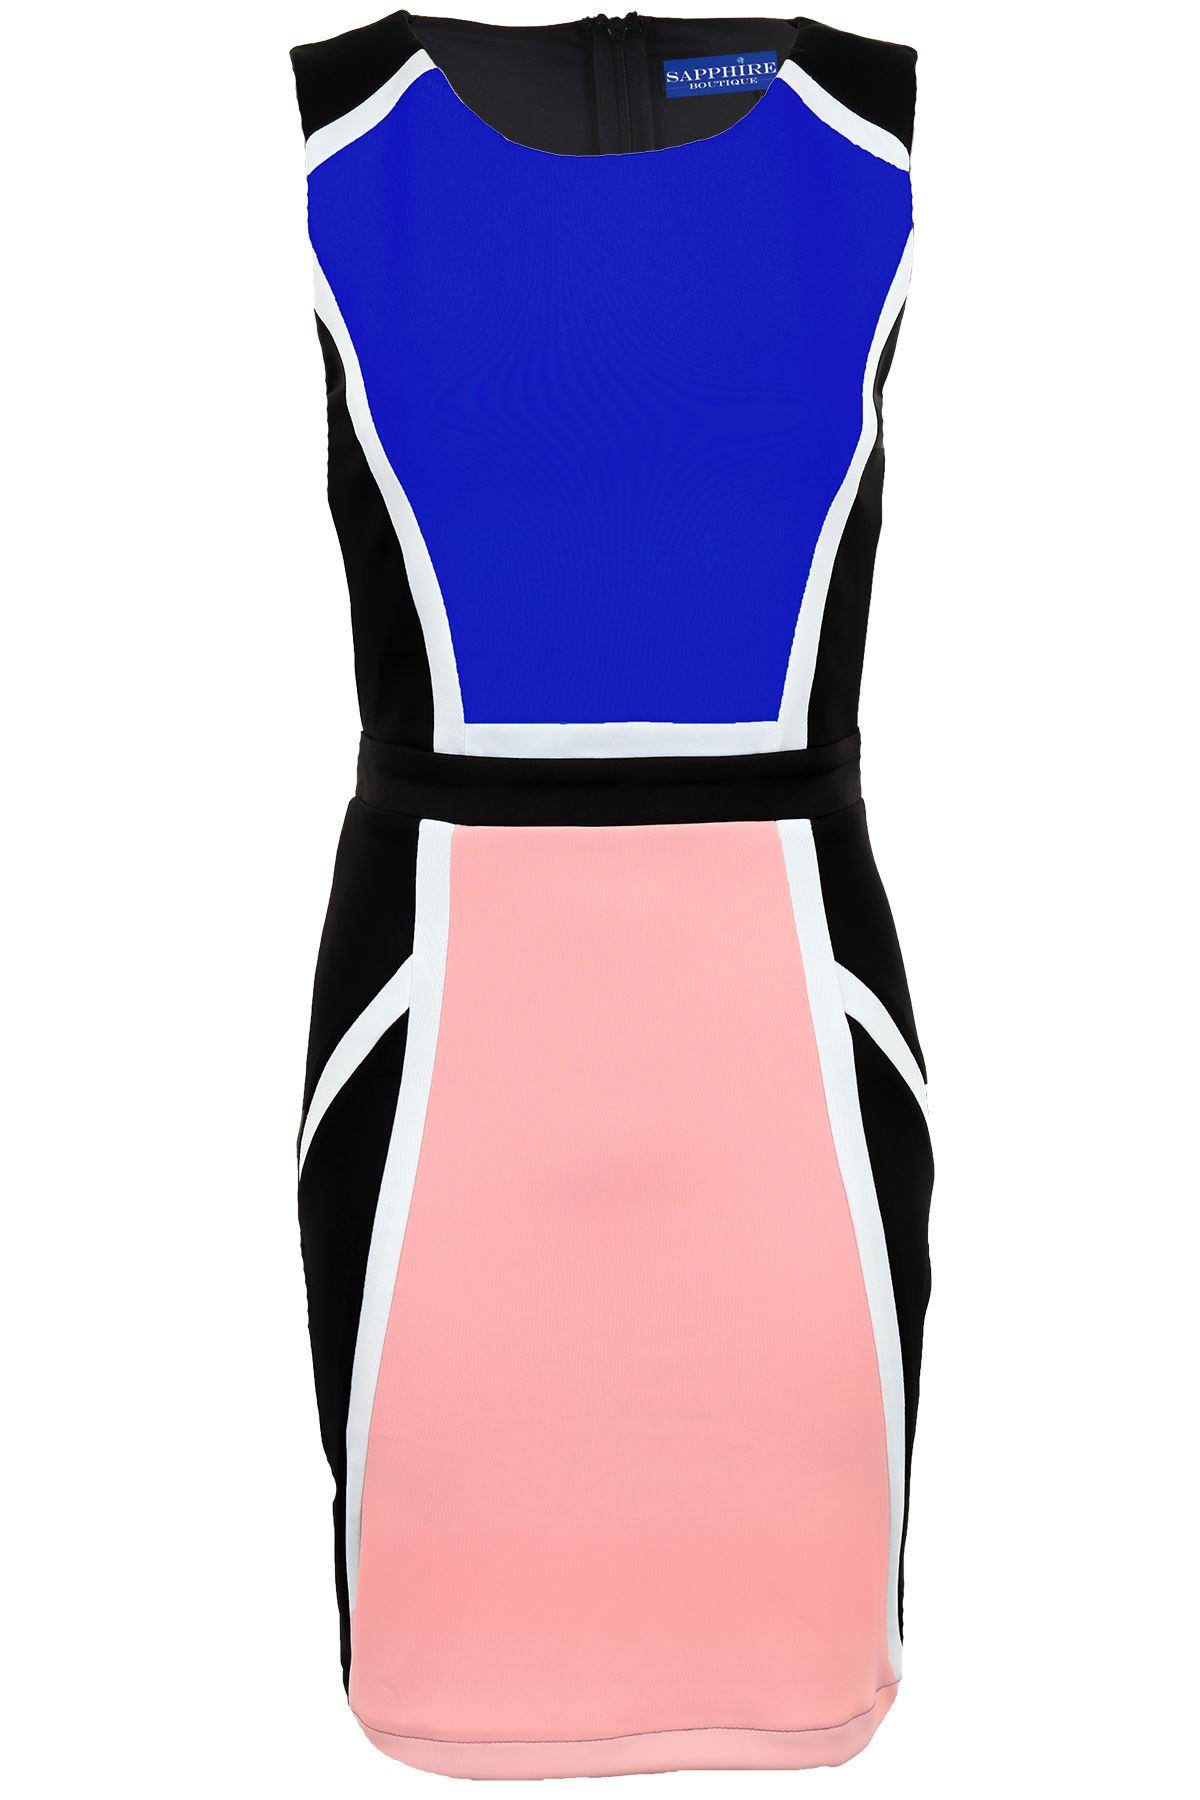 Ladies Sleeveless Black Contrast Abstract Panel Evening Smart Bodycon Dress